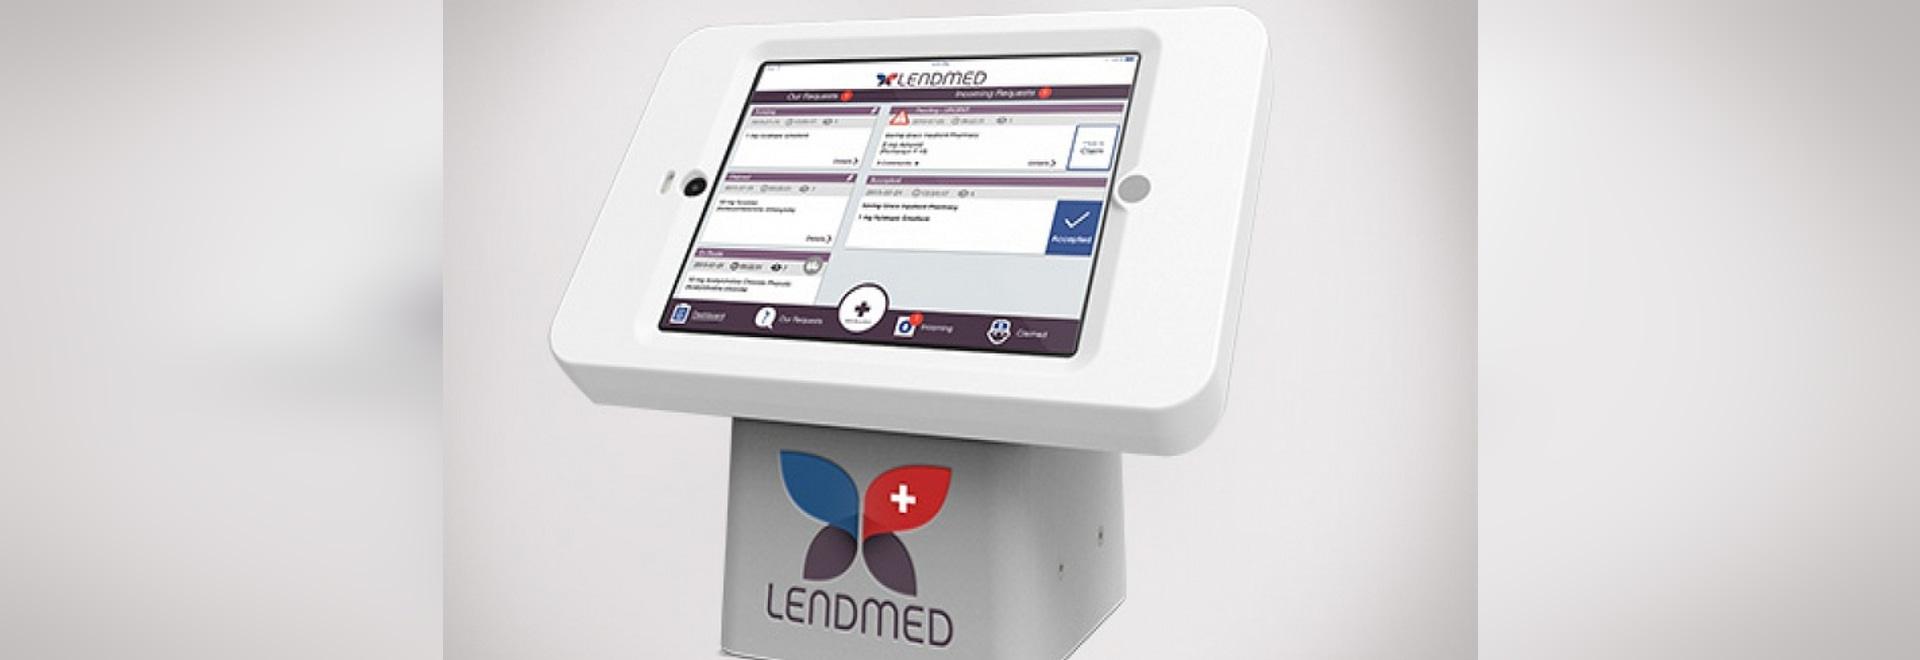 Digital Control Helps Hospitals Share Equipment